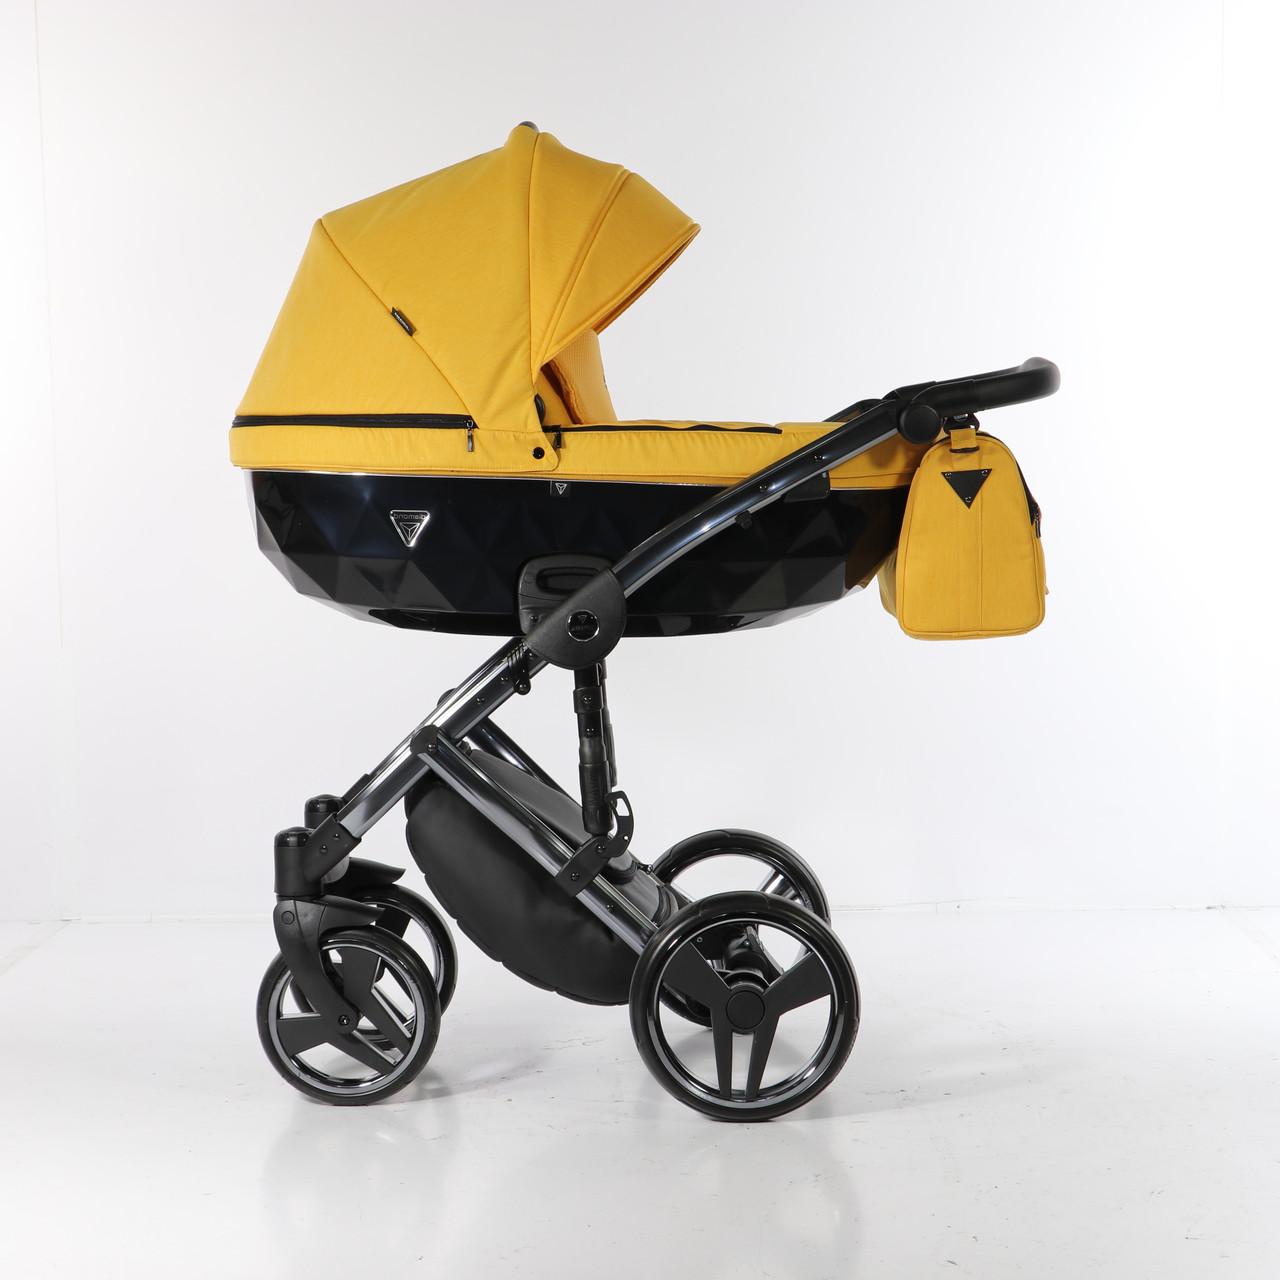 Дитяча універсальна коляска 2 в 1 Junama Saphire 05